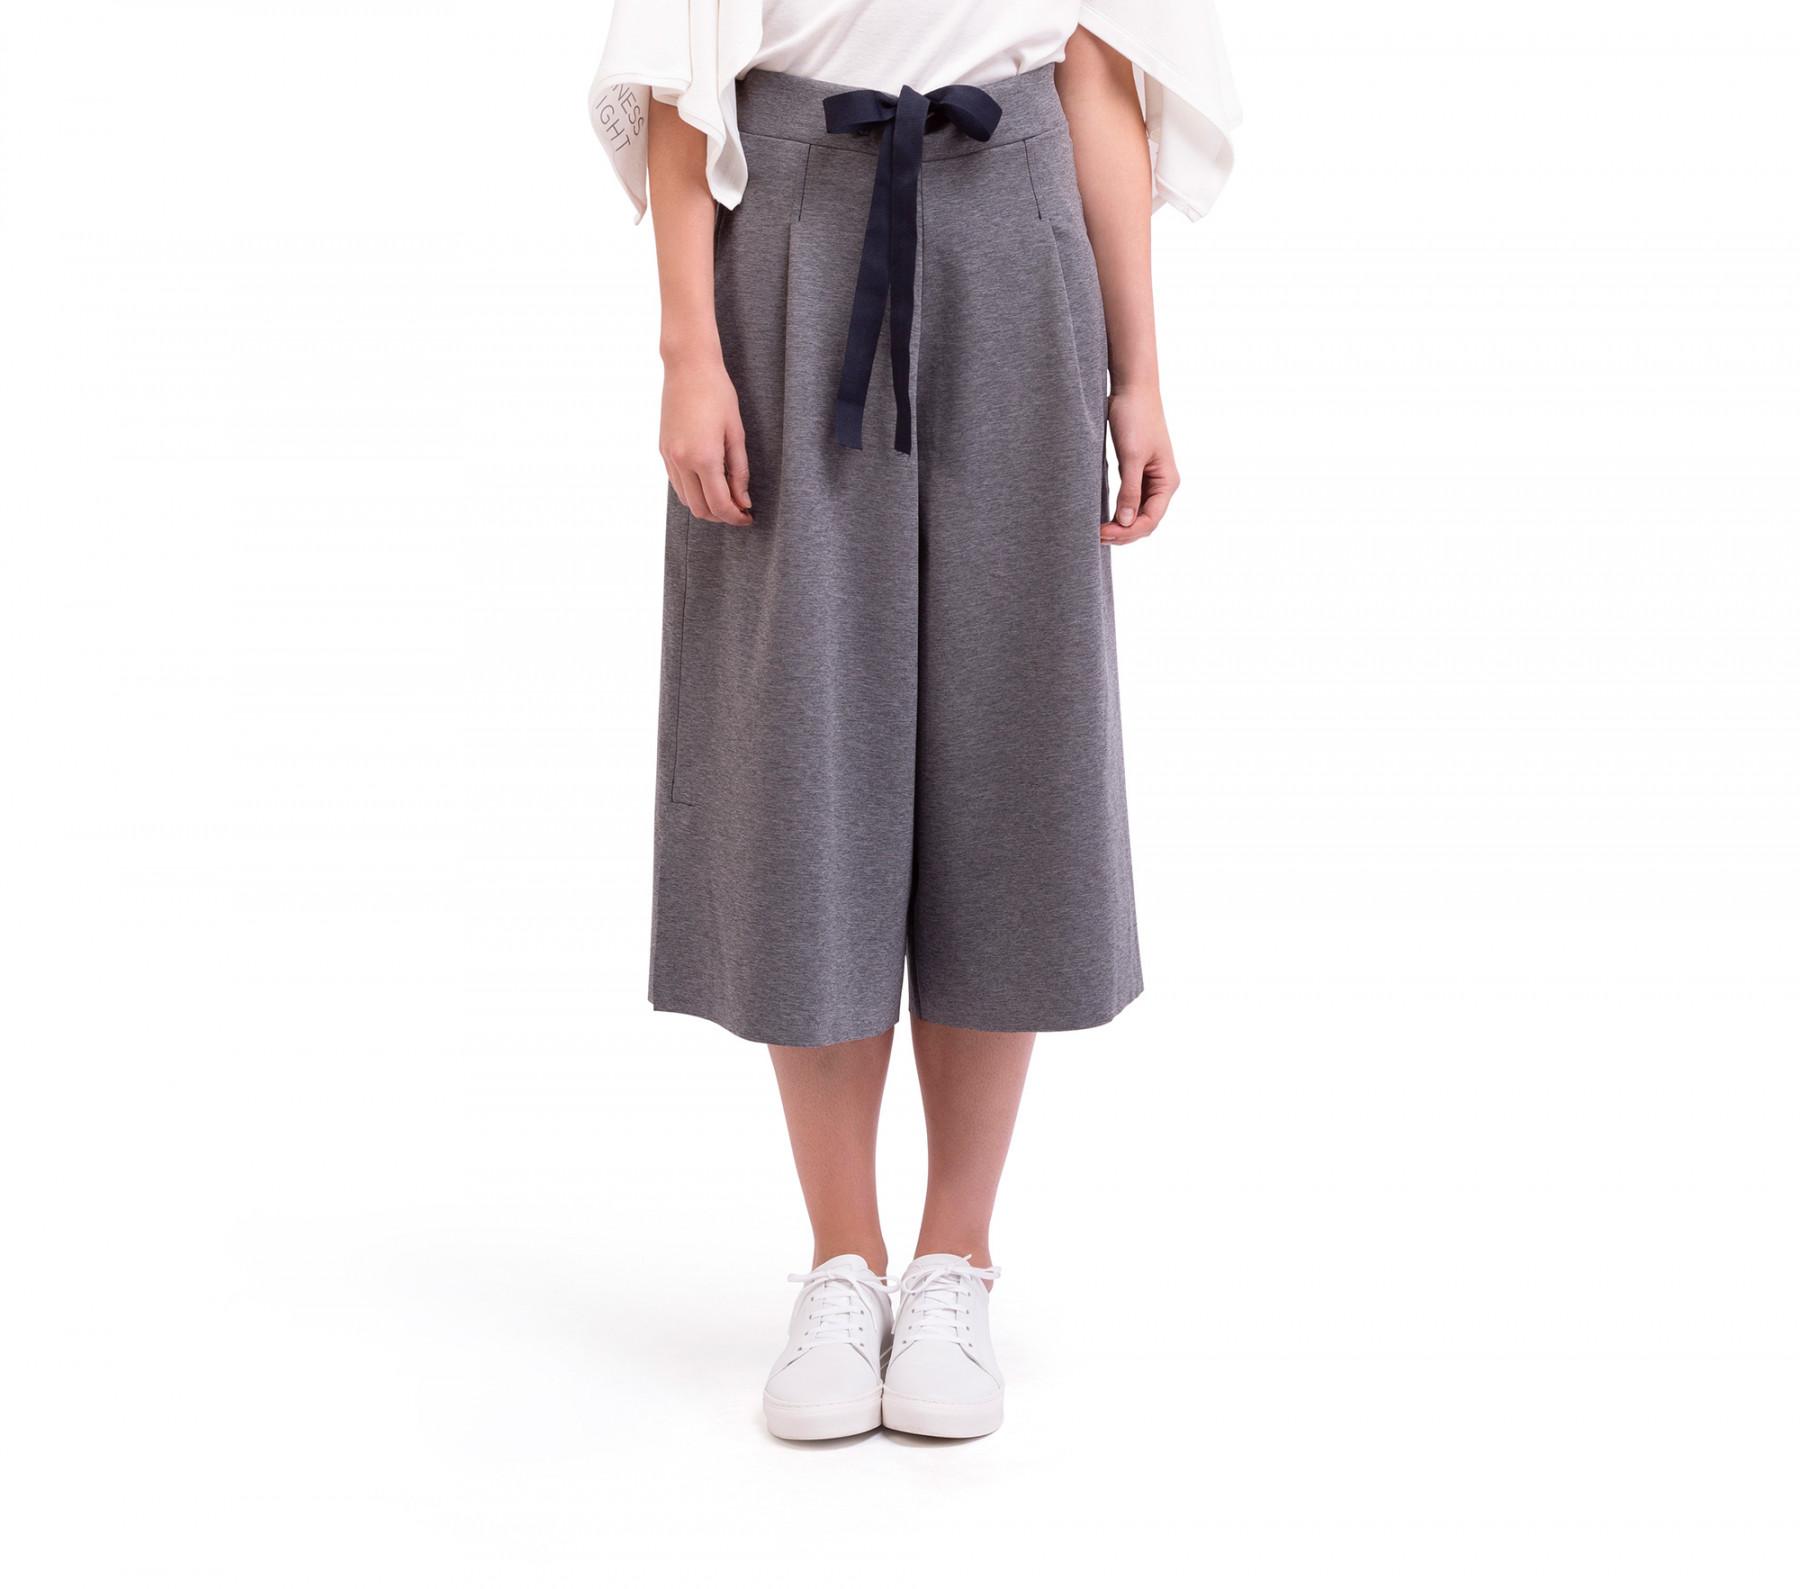 separation shoes 471ea ebf8e Gonna-pantalone in maglia stretch double-face